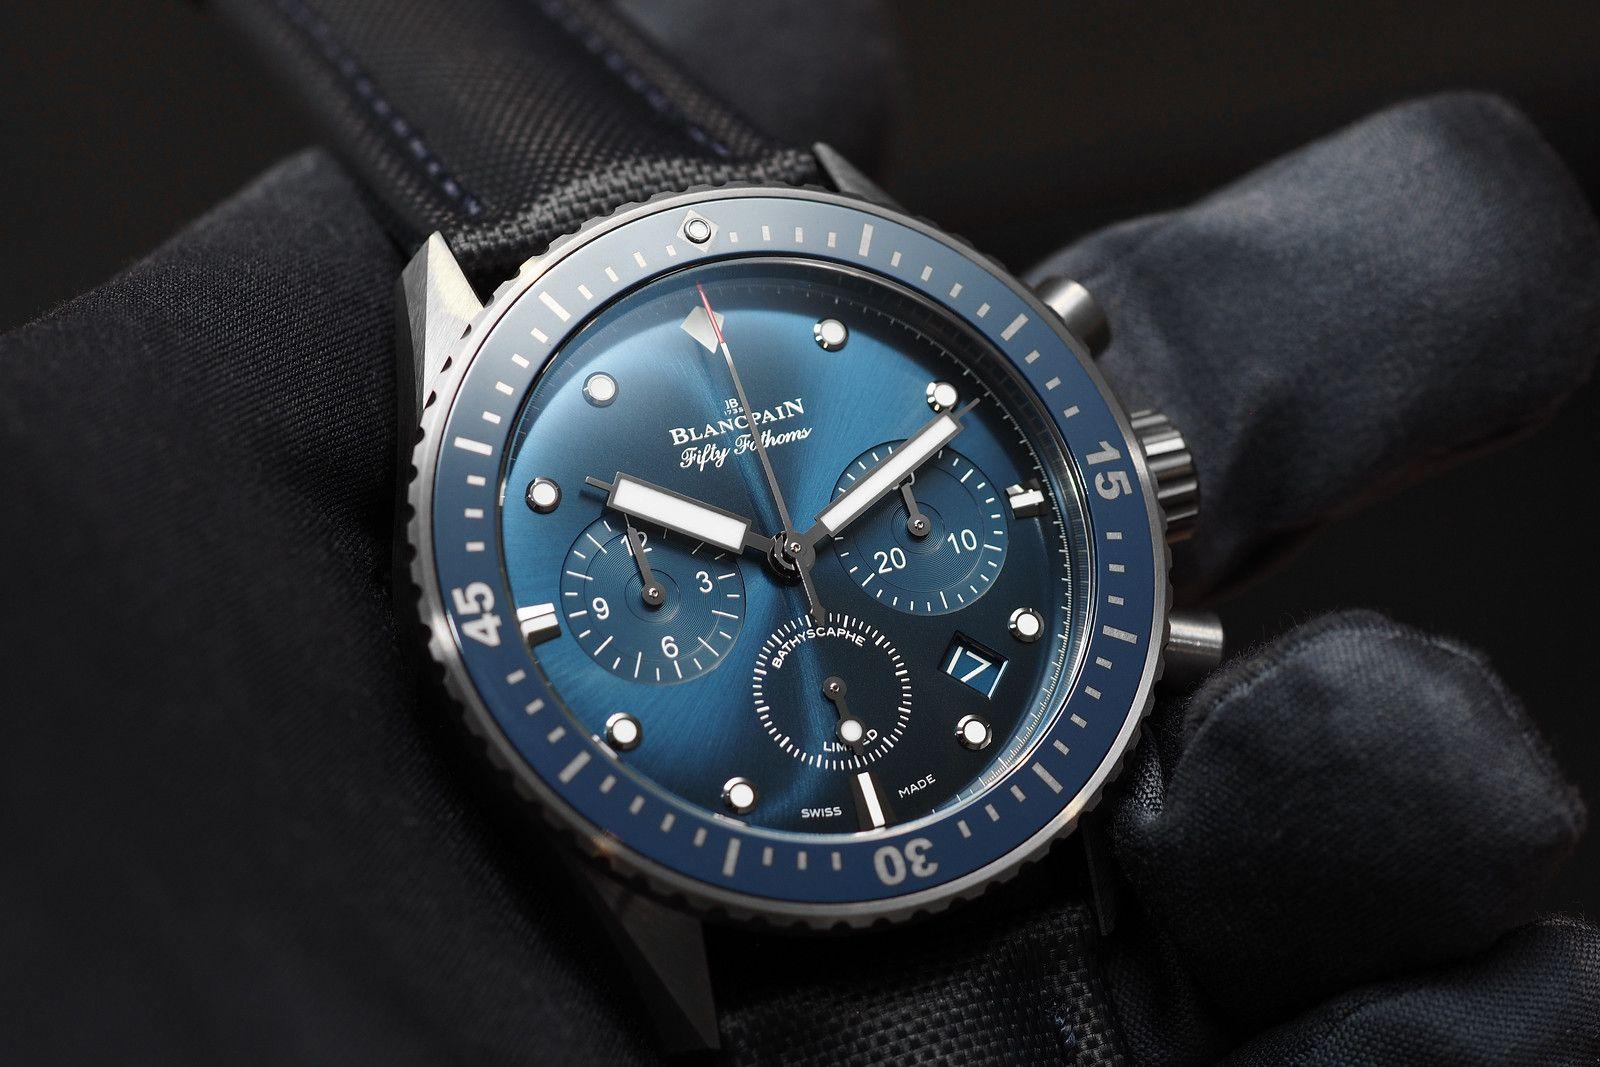 Blancpain Bathyscaphe Chronograph Flyback Ocean Commitment